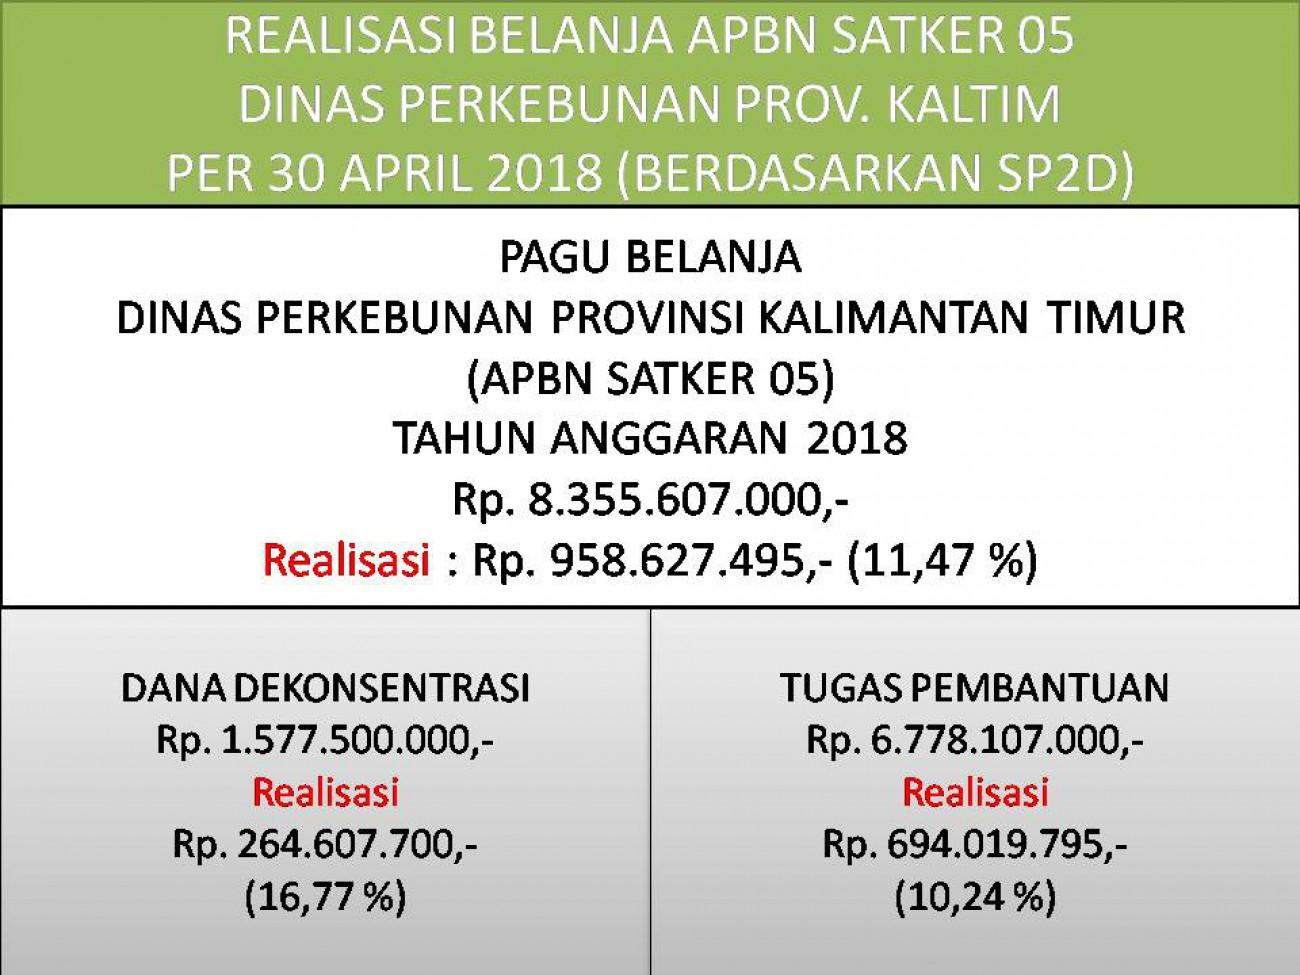 Laporan Realisasi APBN Satker 05 (Direktorat Jenderal Perkebunan) Dinas Perkebunan Prov. Kaltim Bulan April 2018